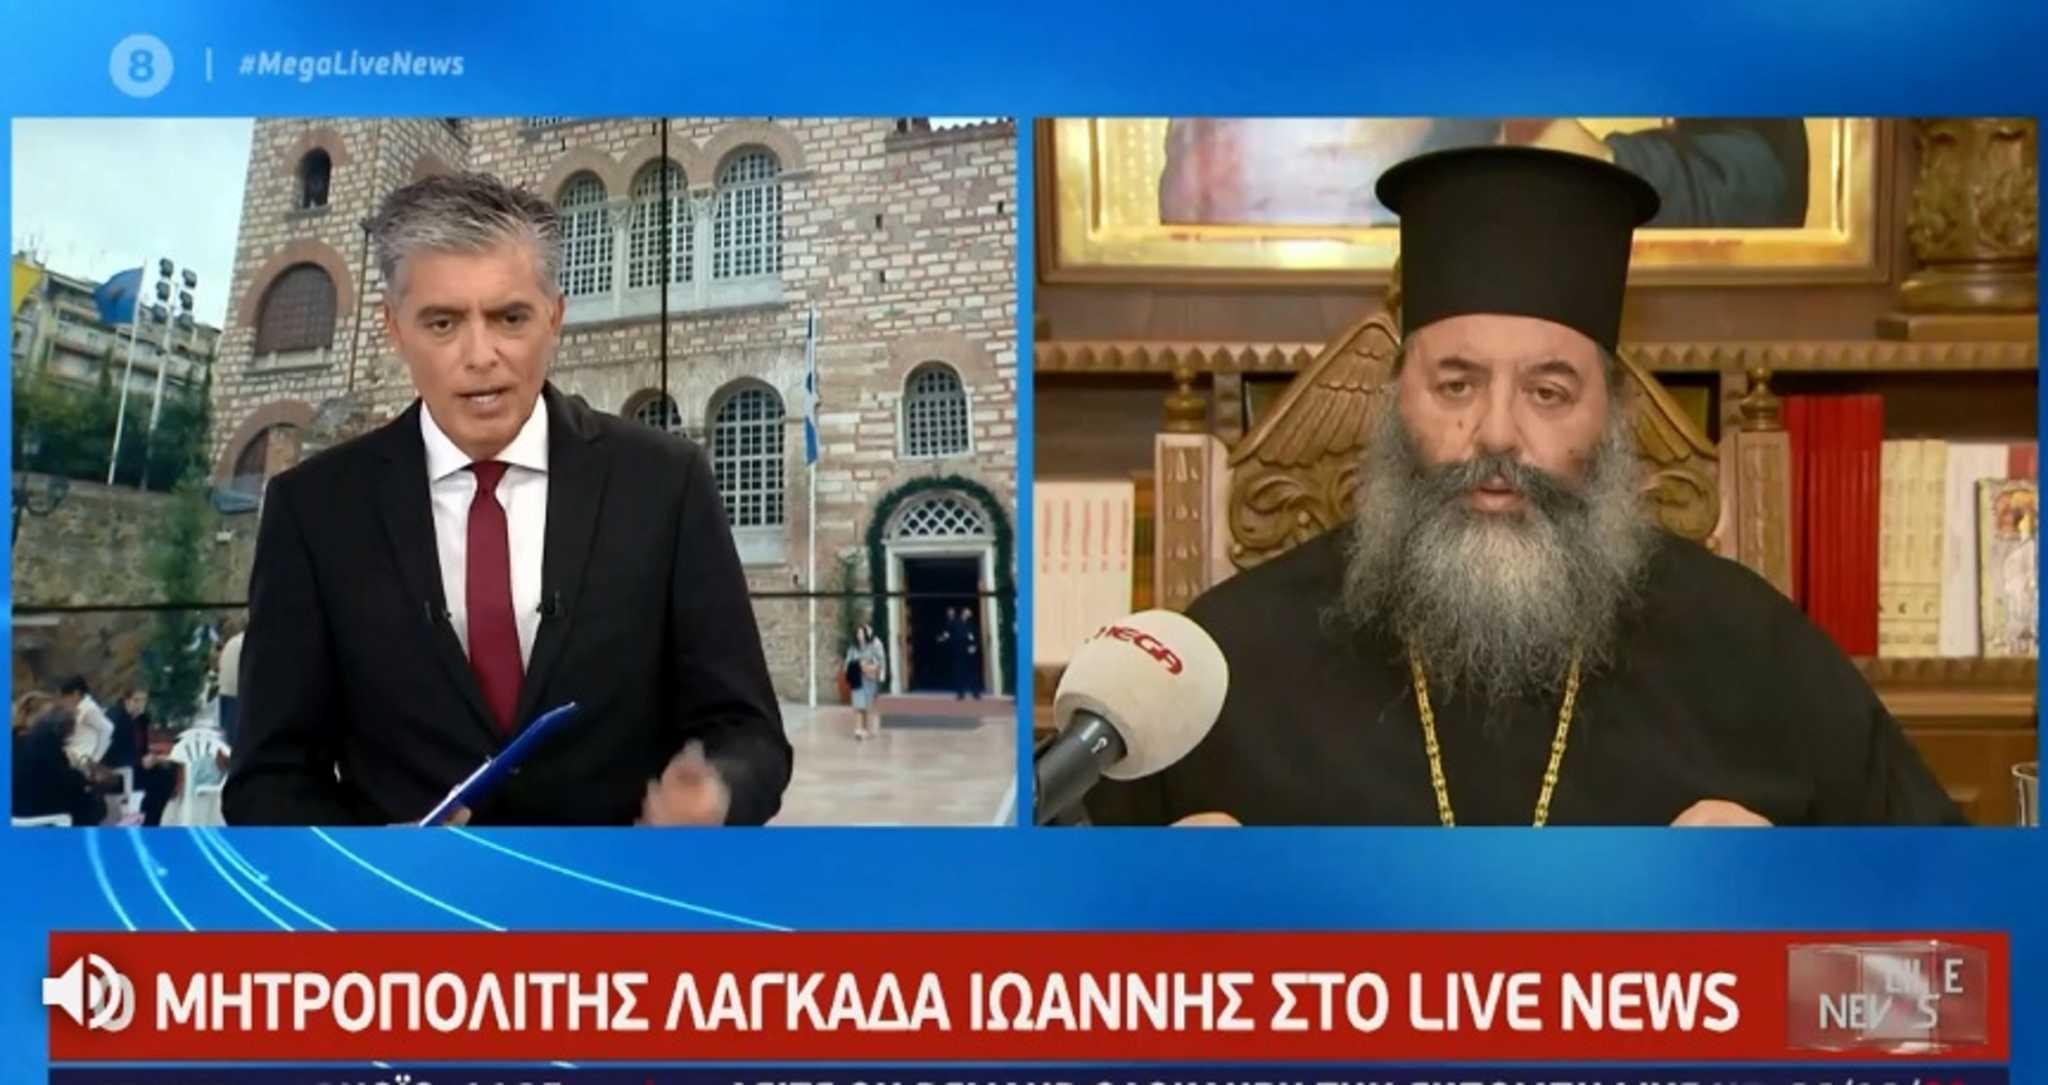 You are currently viewing Τι λέει ο Μητροπολίτης Λαγκαδά για τον συνωστισμό στις εκκλησίες και τις μάσκες